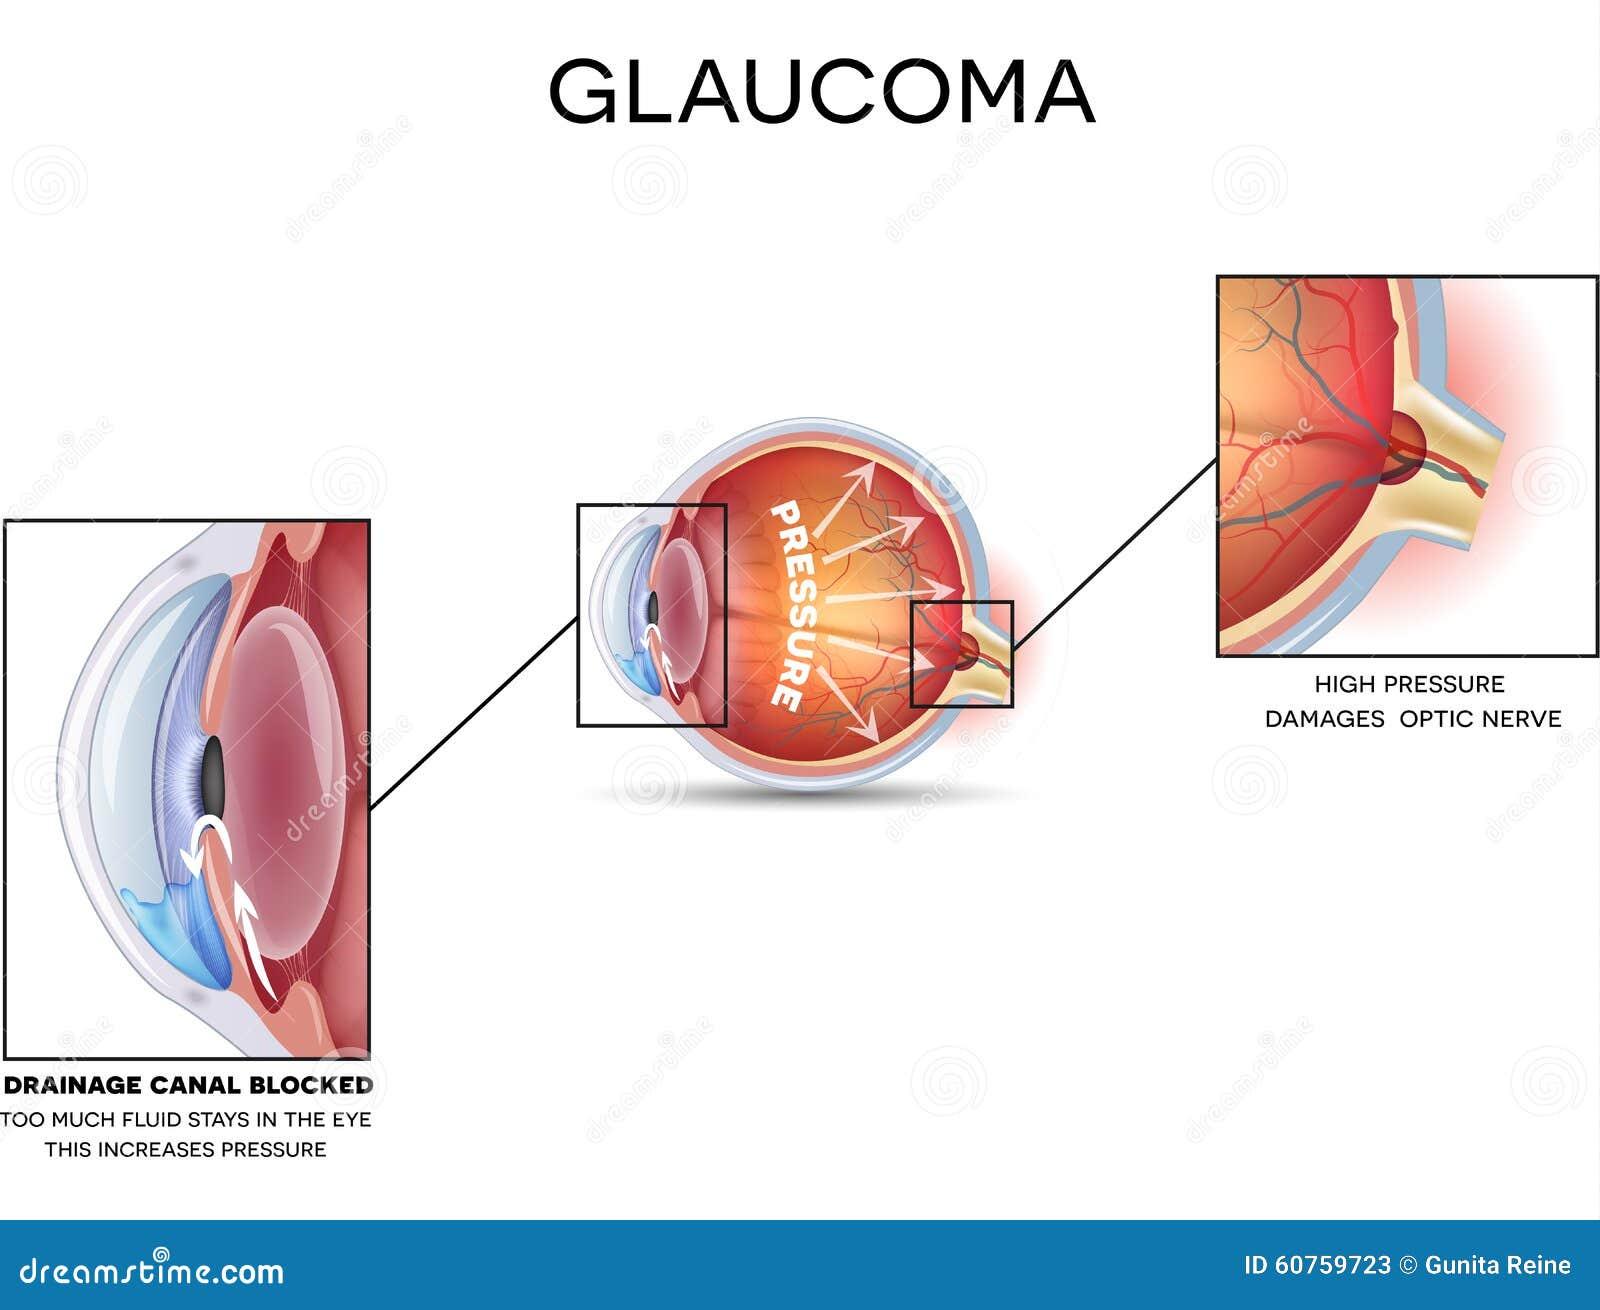 Glaucoma stock vector. Illustration of drainage, eyes - 60759723